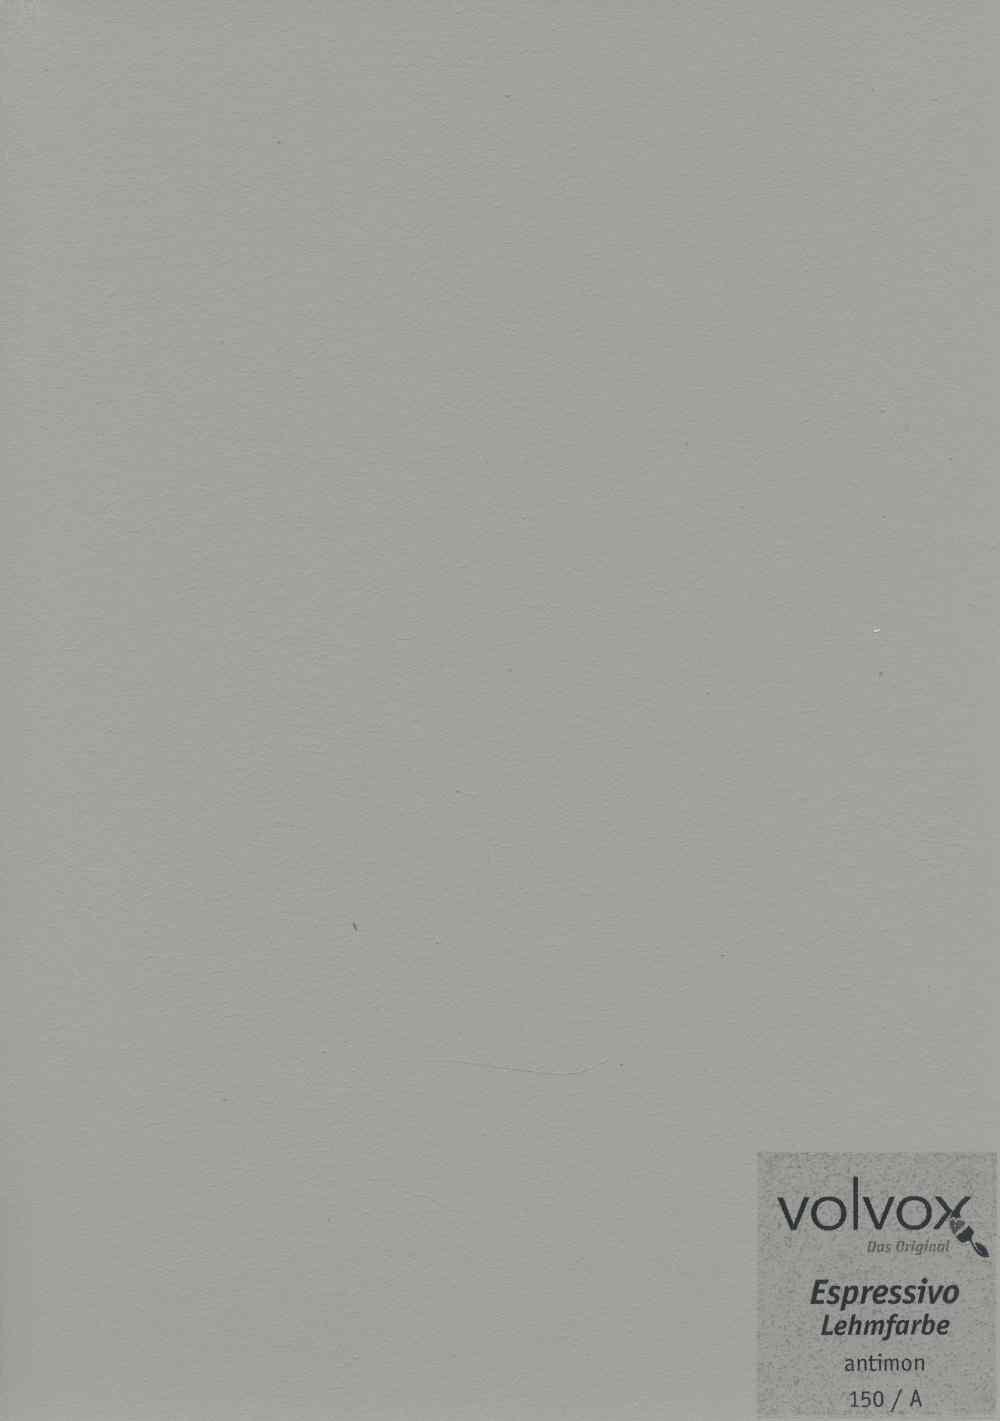 Volvox Espressivo Lehmfarbe 150 antimon